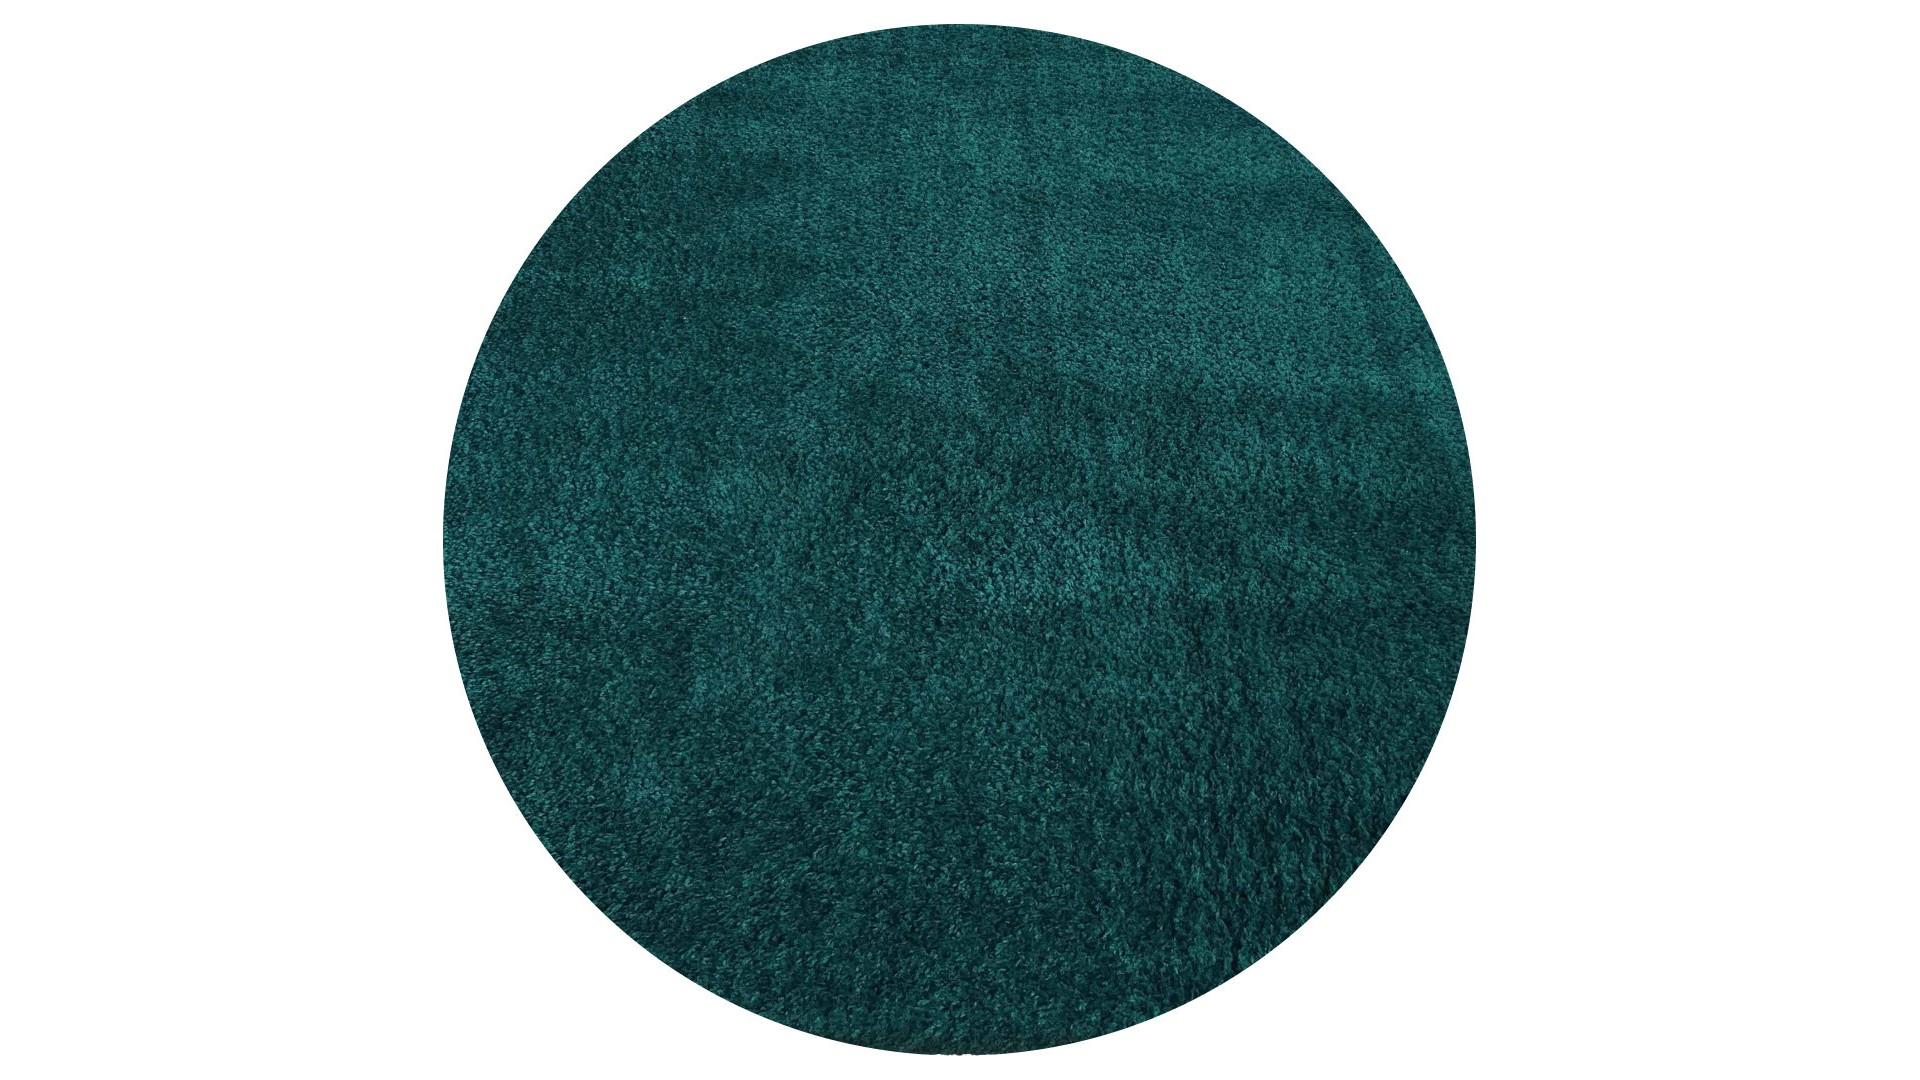 Niesamowity nowy kolor dywanu Shaggy - butelkowa zieleń